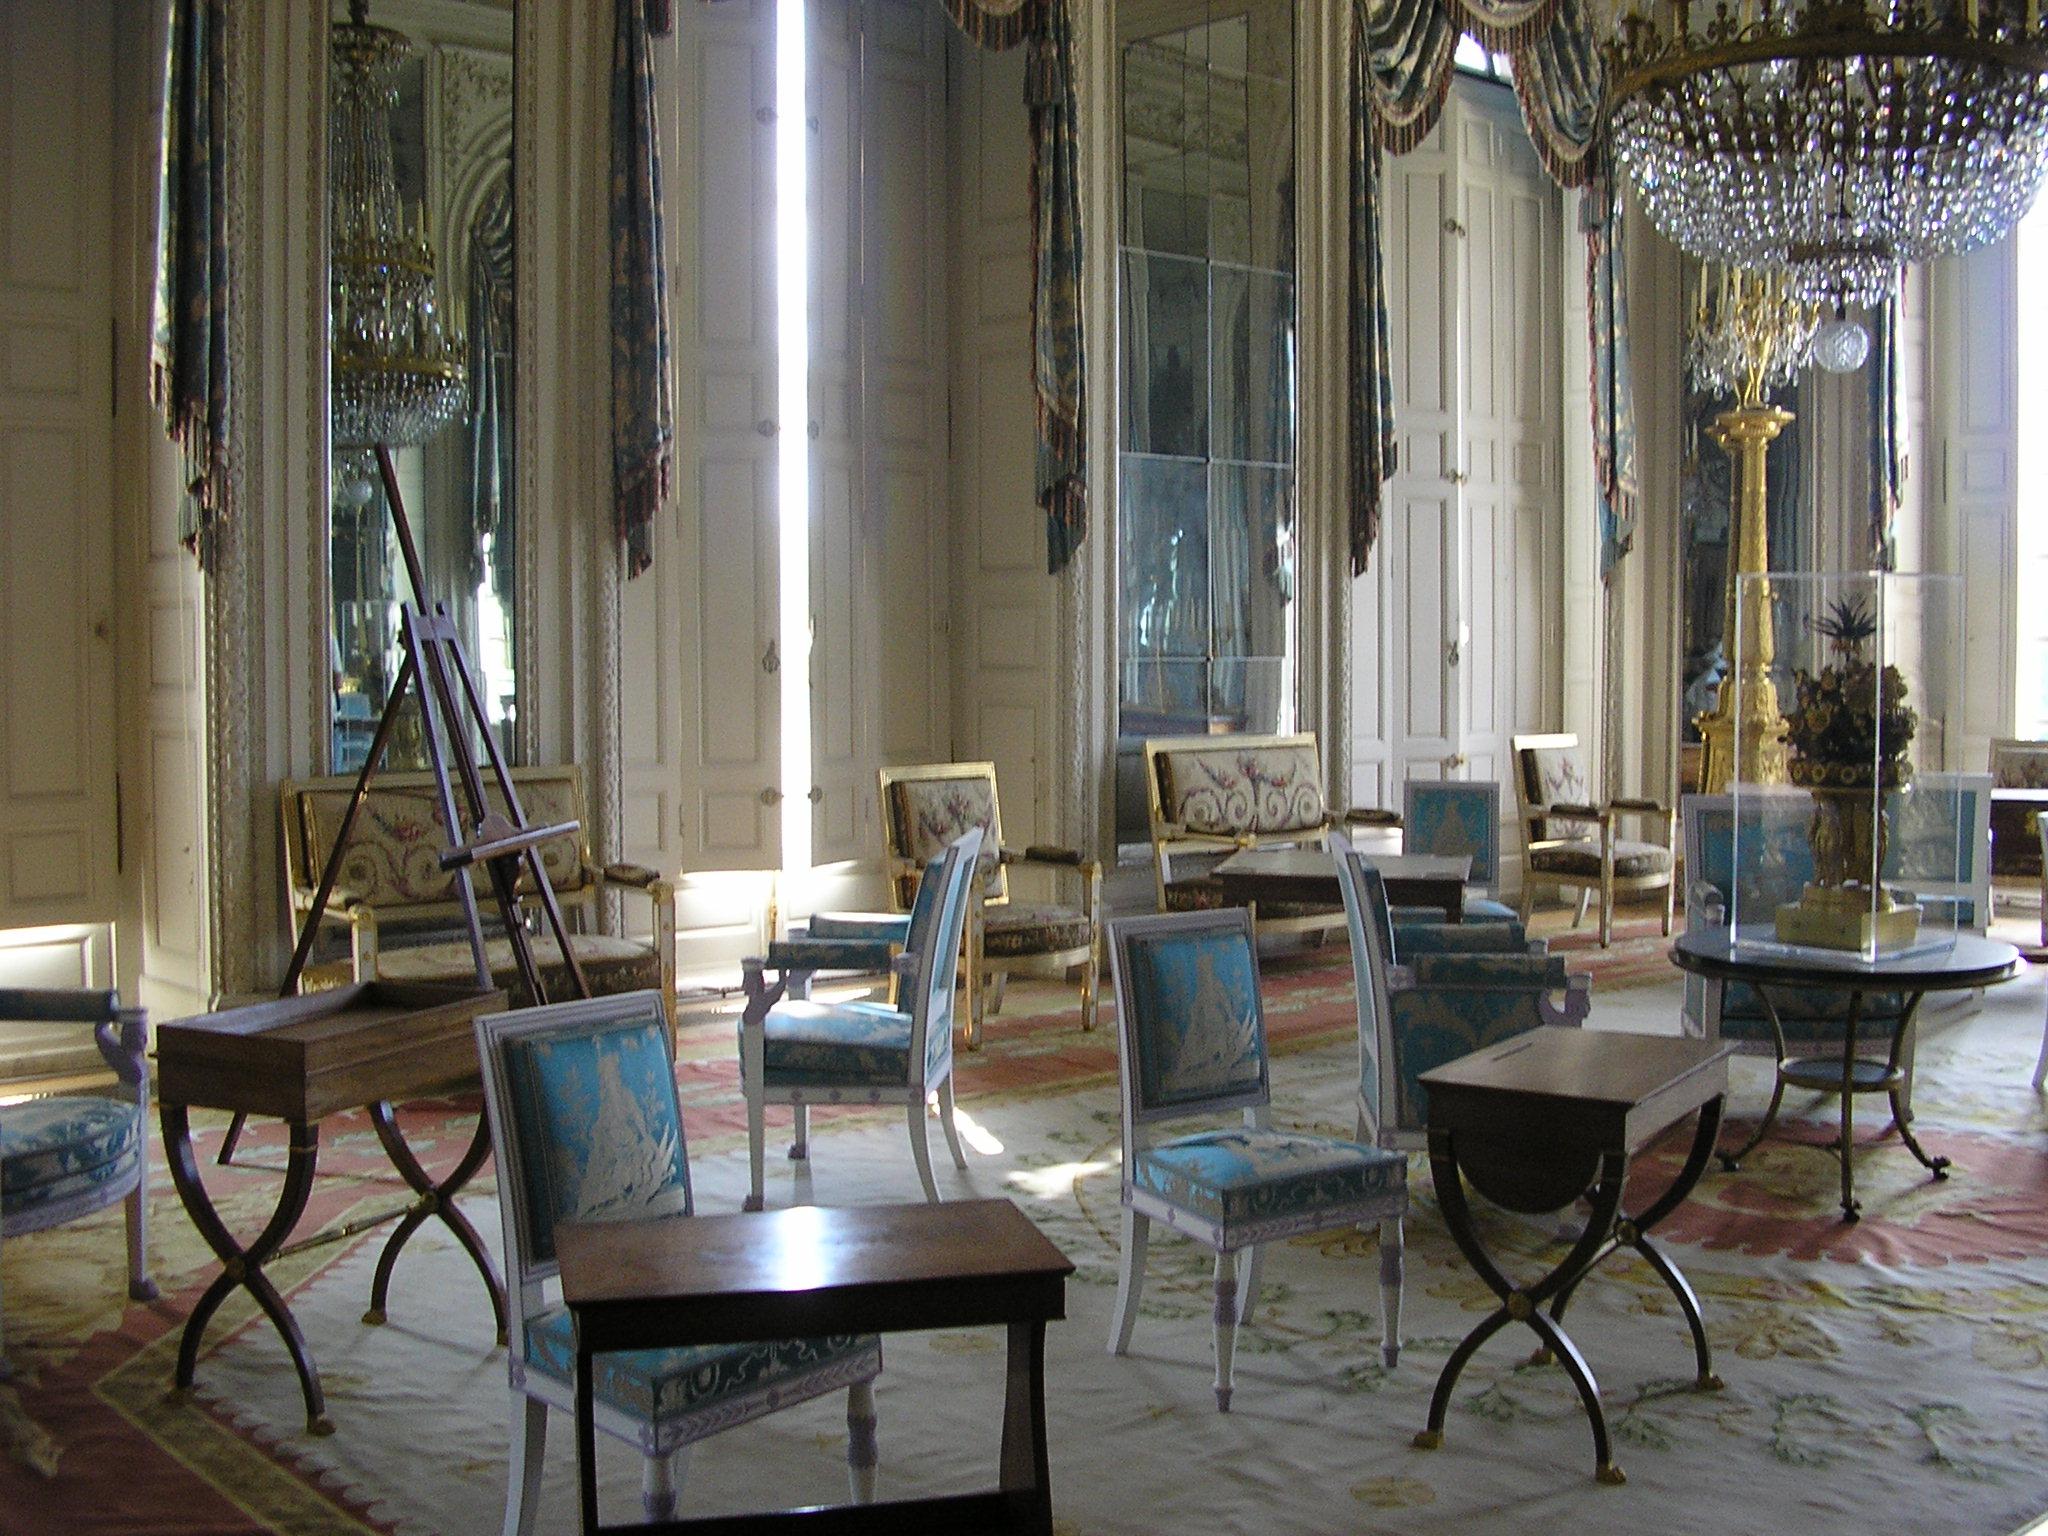 Image Result For French Restaurant Interior Design